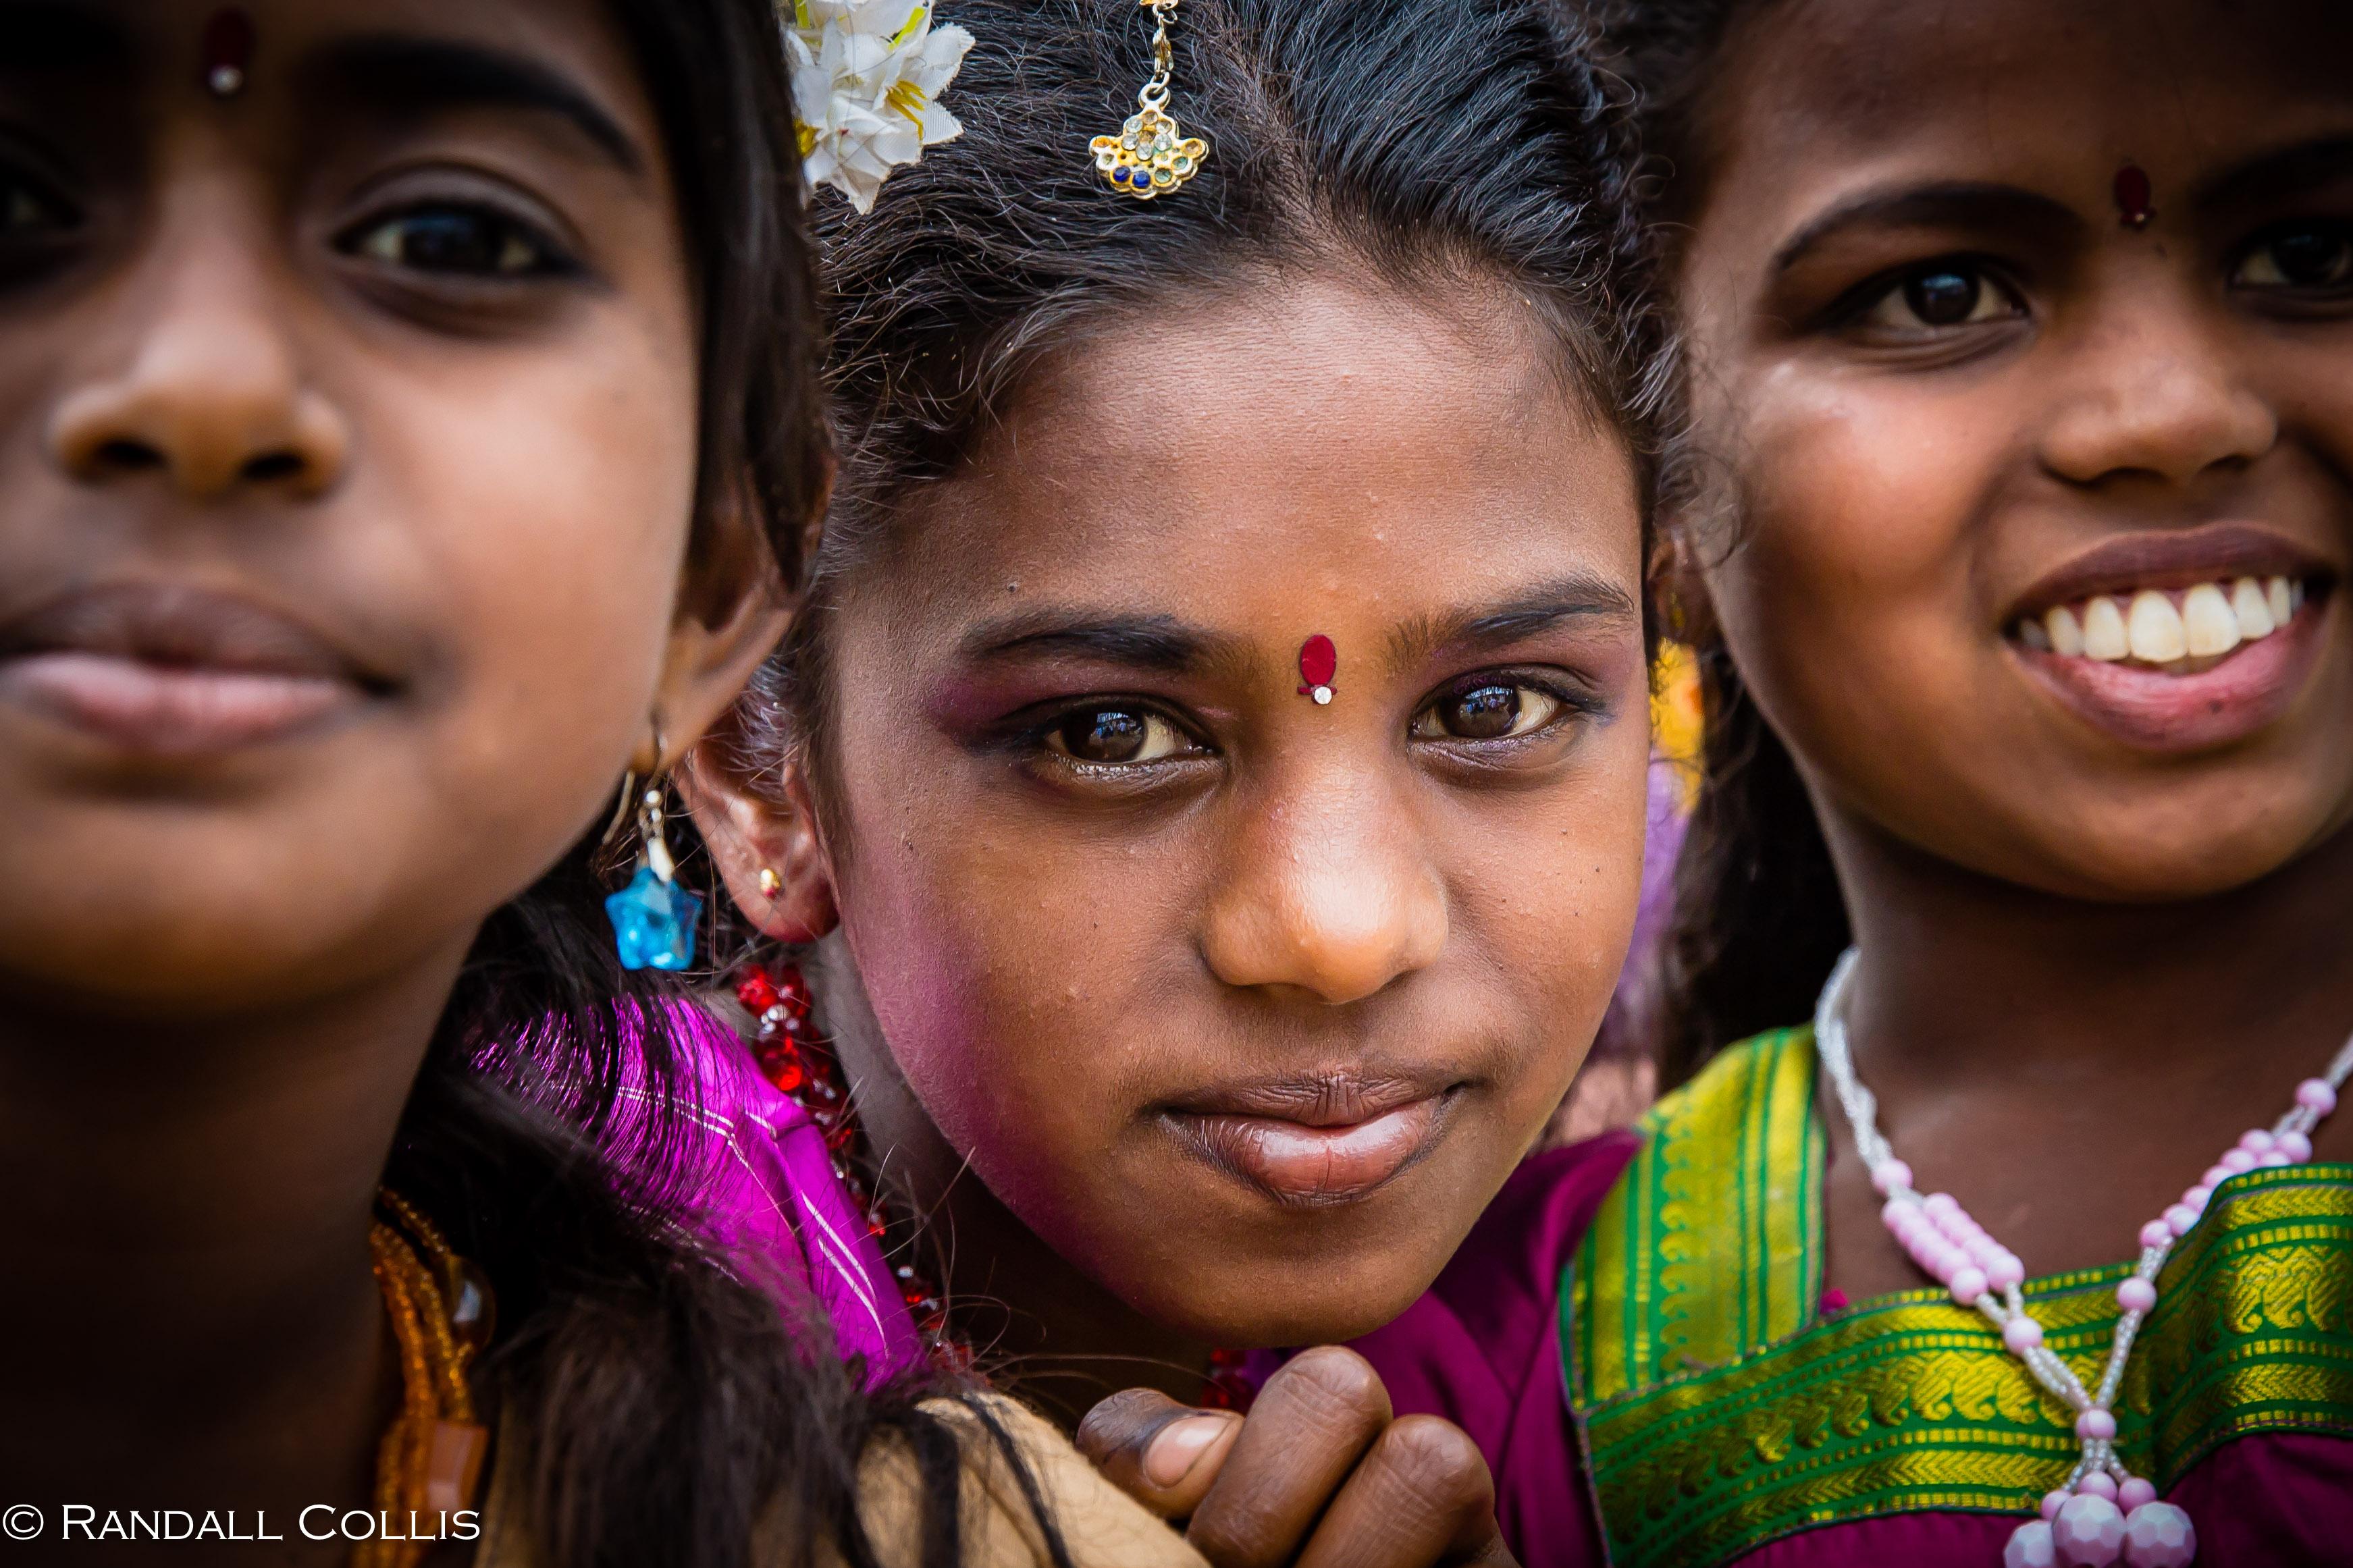 Perspectives of Sri Lanka